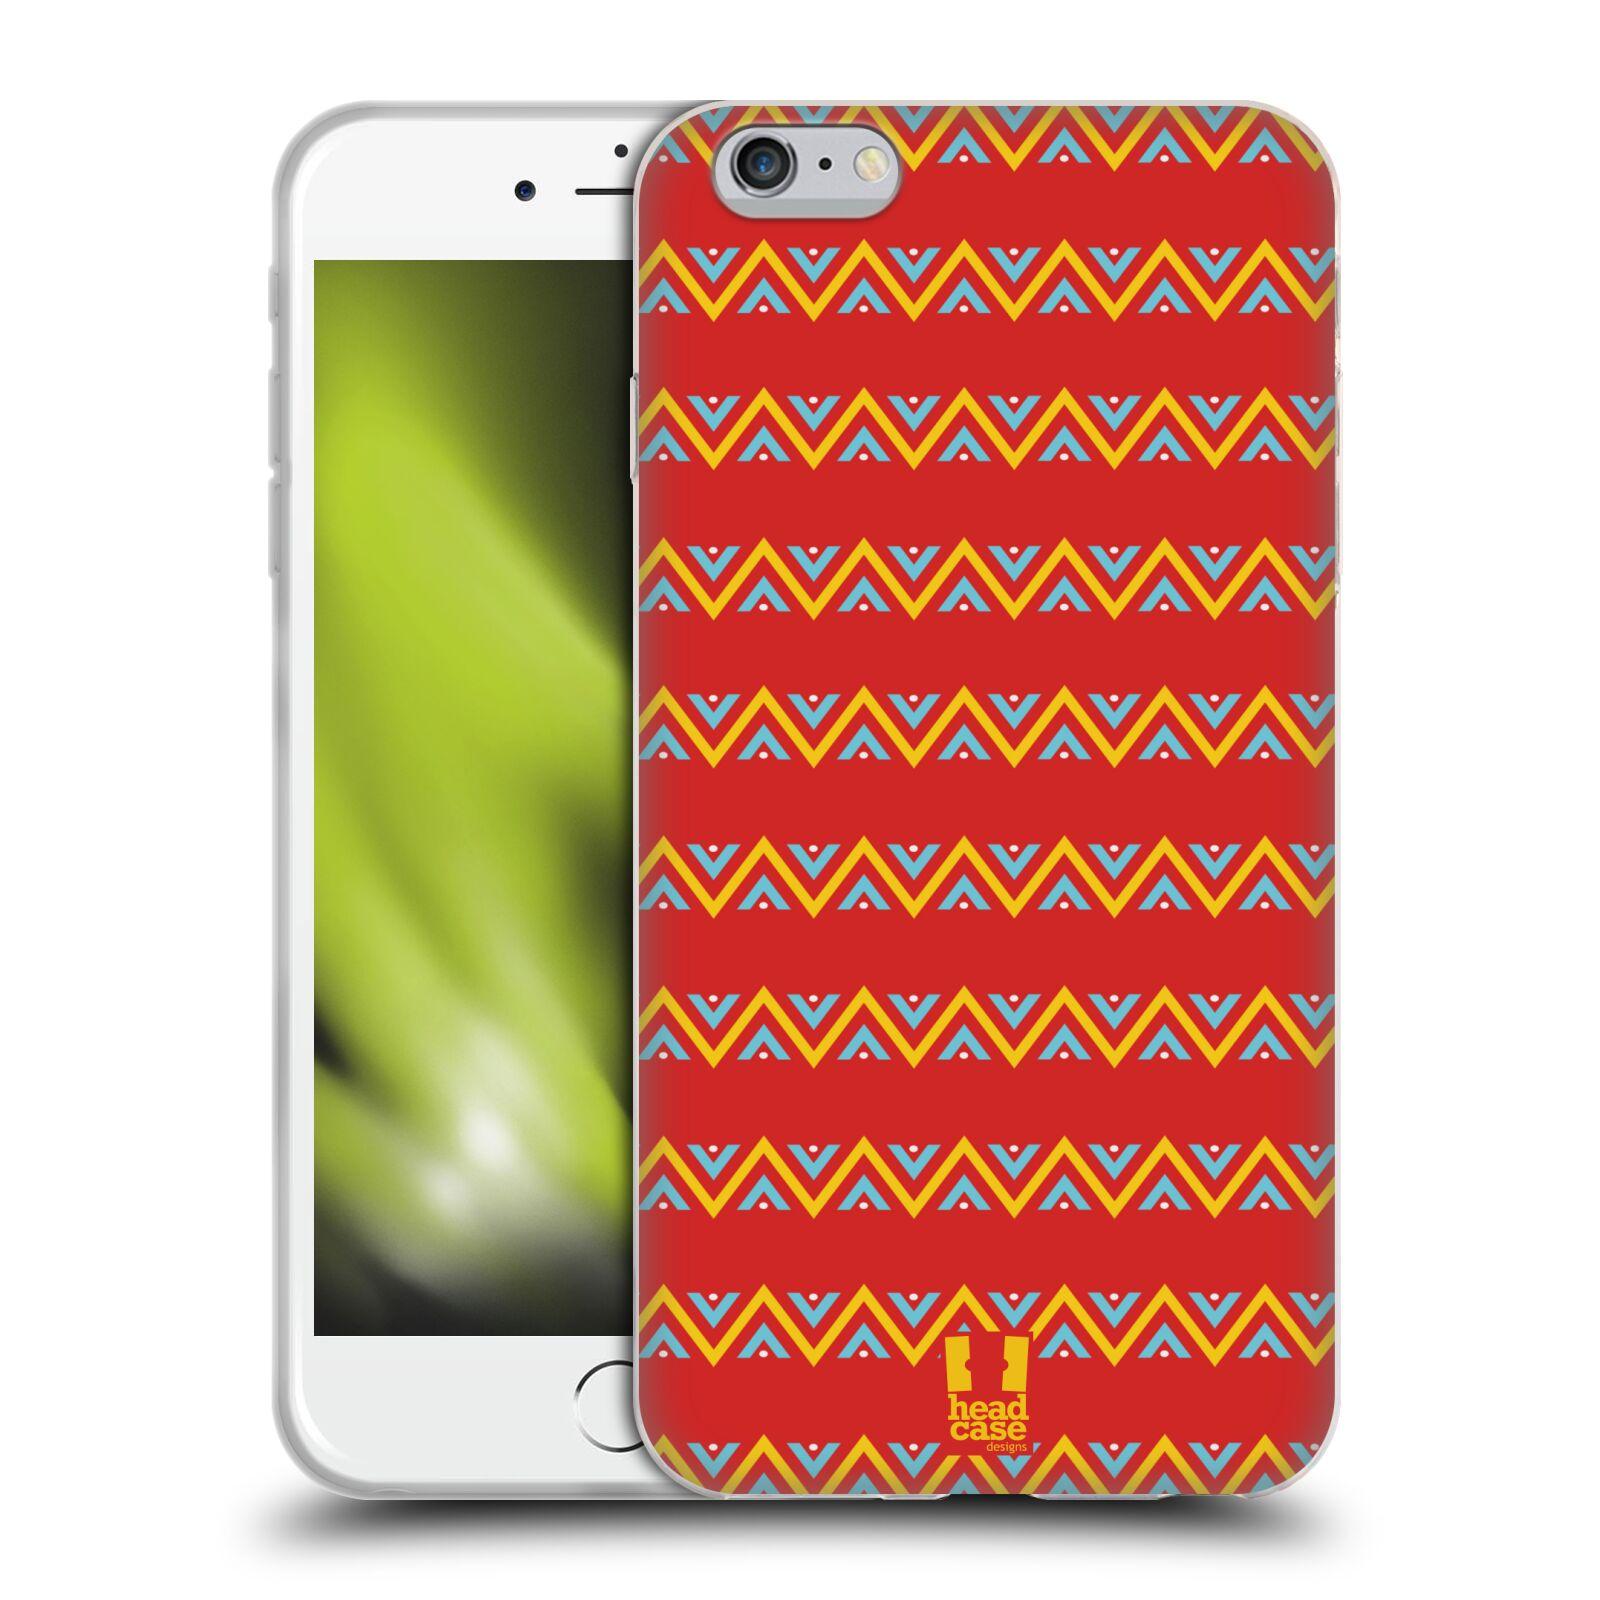 HEAD CASE silikonový obal na mobil Apple Iphone 6 PLUS/ 6S PLUS vzor Africké motivy CIK CAK